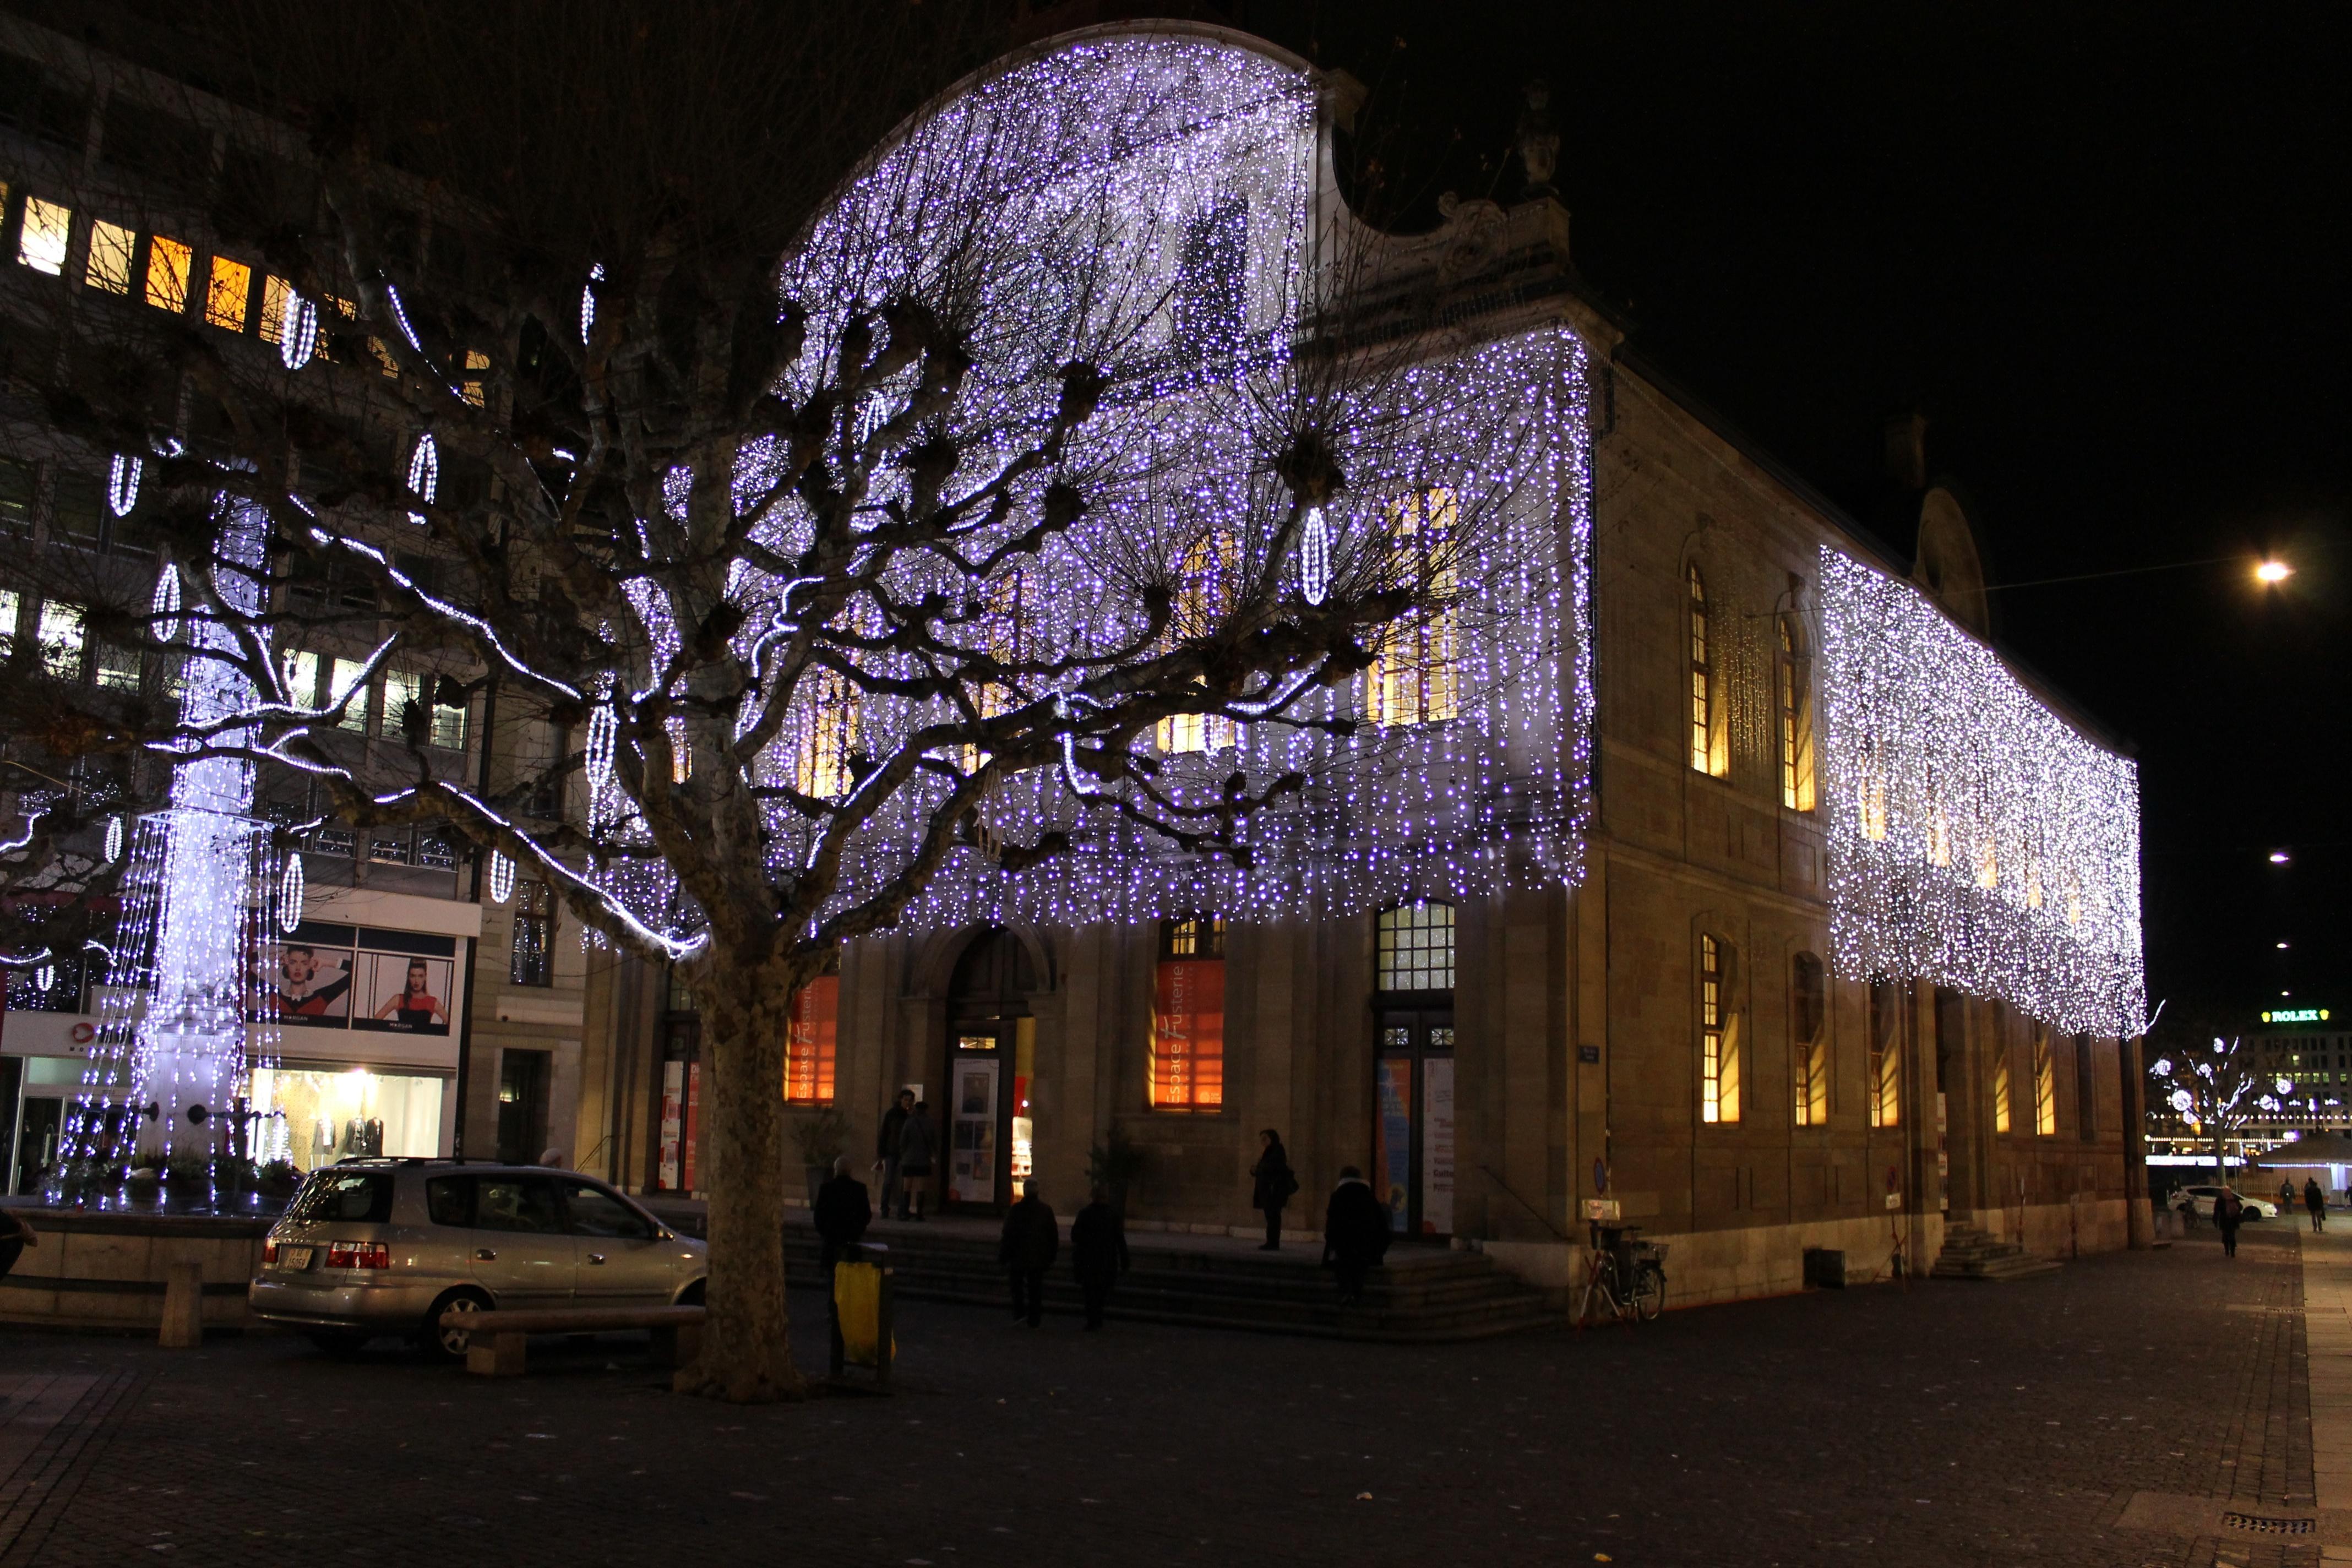 #9E7D2D Christmas Decoration In Geneva 2012 Flickr Photo  5545 decorations noel geneve 4272x2848 px @ aertt.com